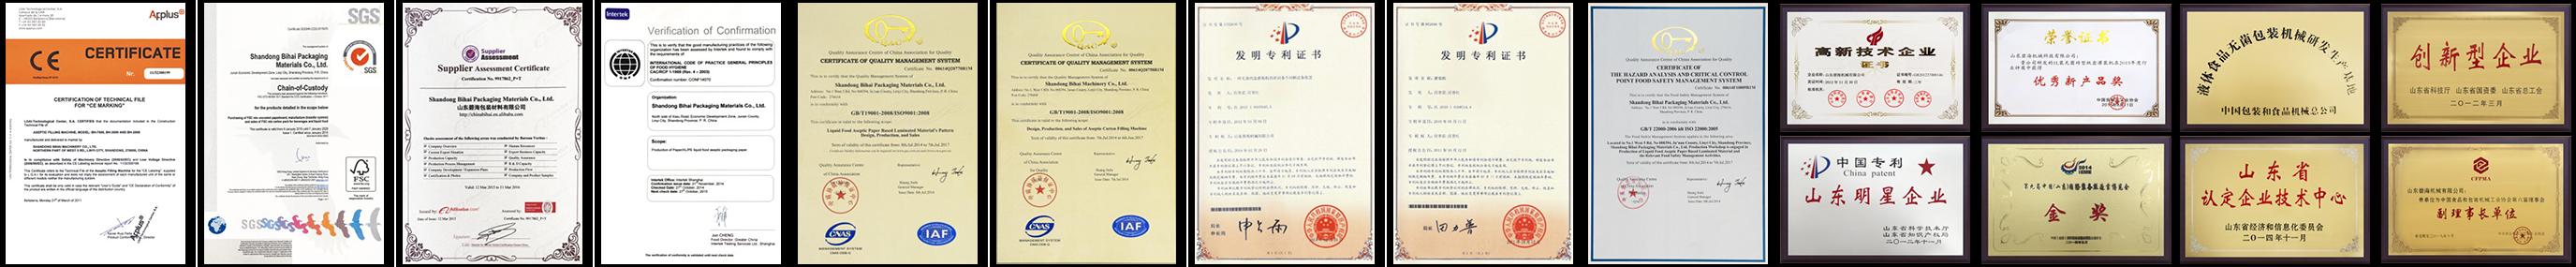 Shandong Bihai Packaging Materials Co., Ltd. - Aseptic Packaging ...